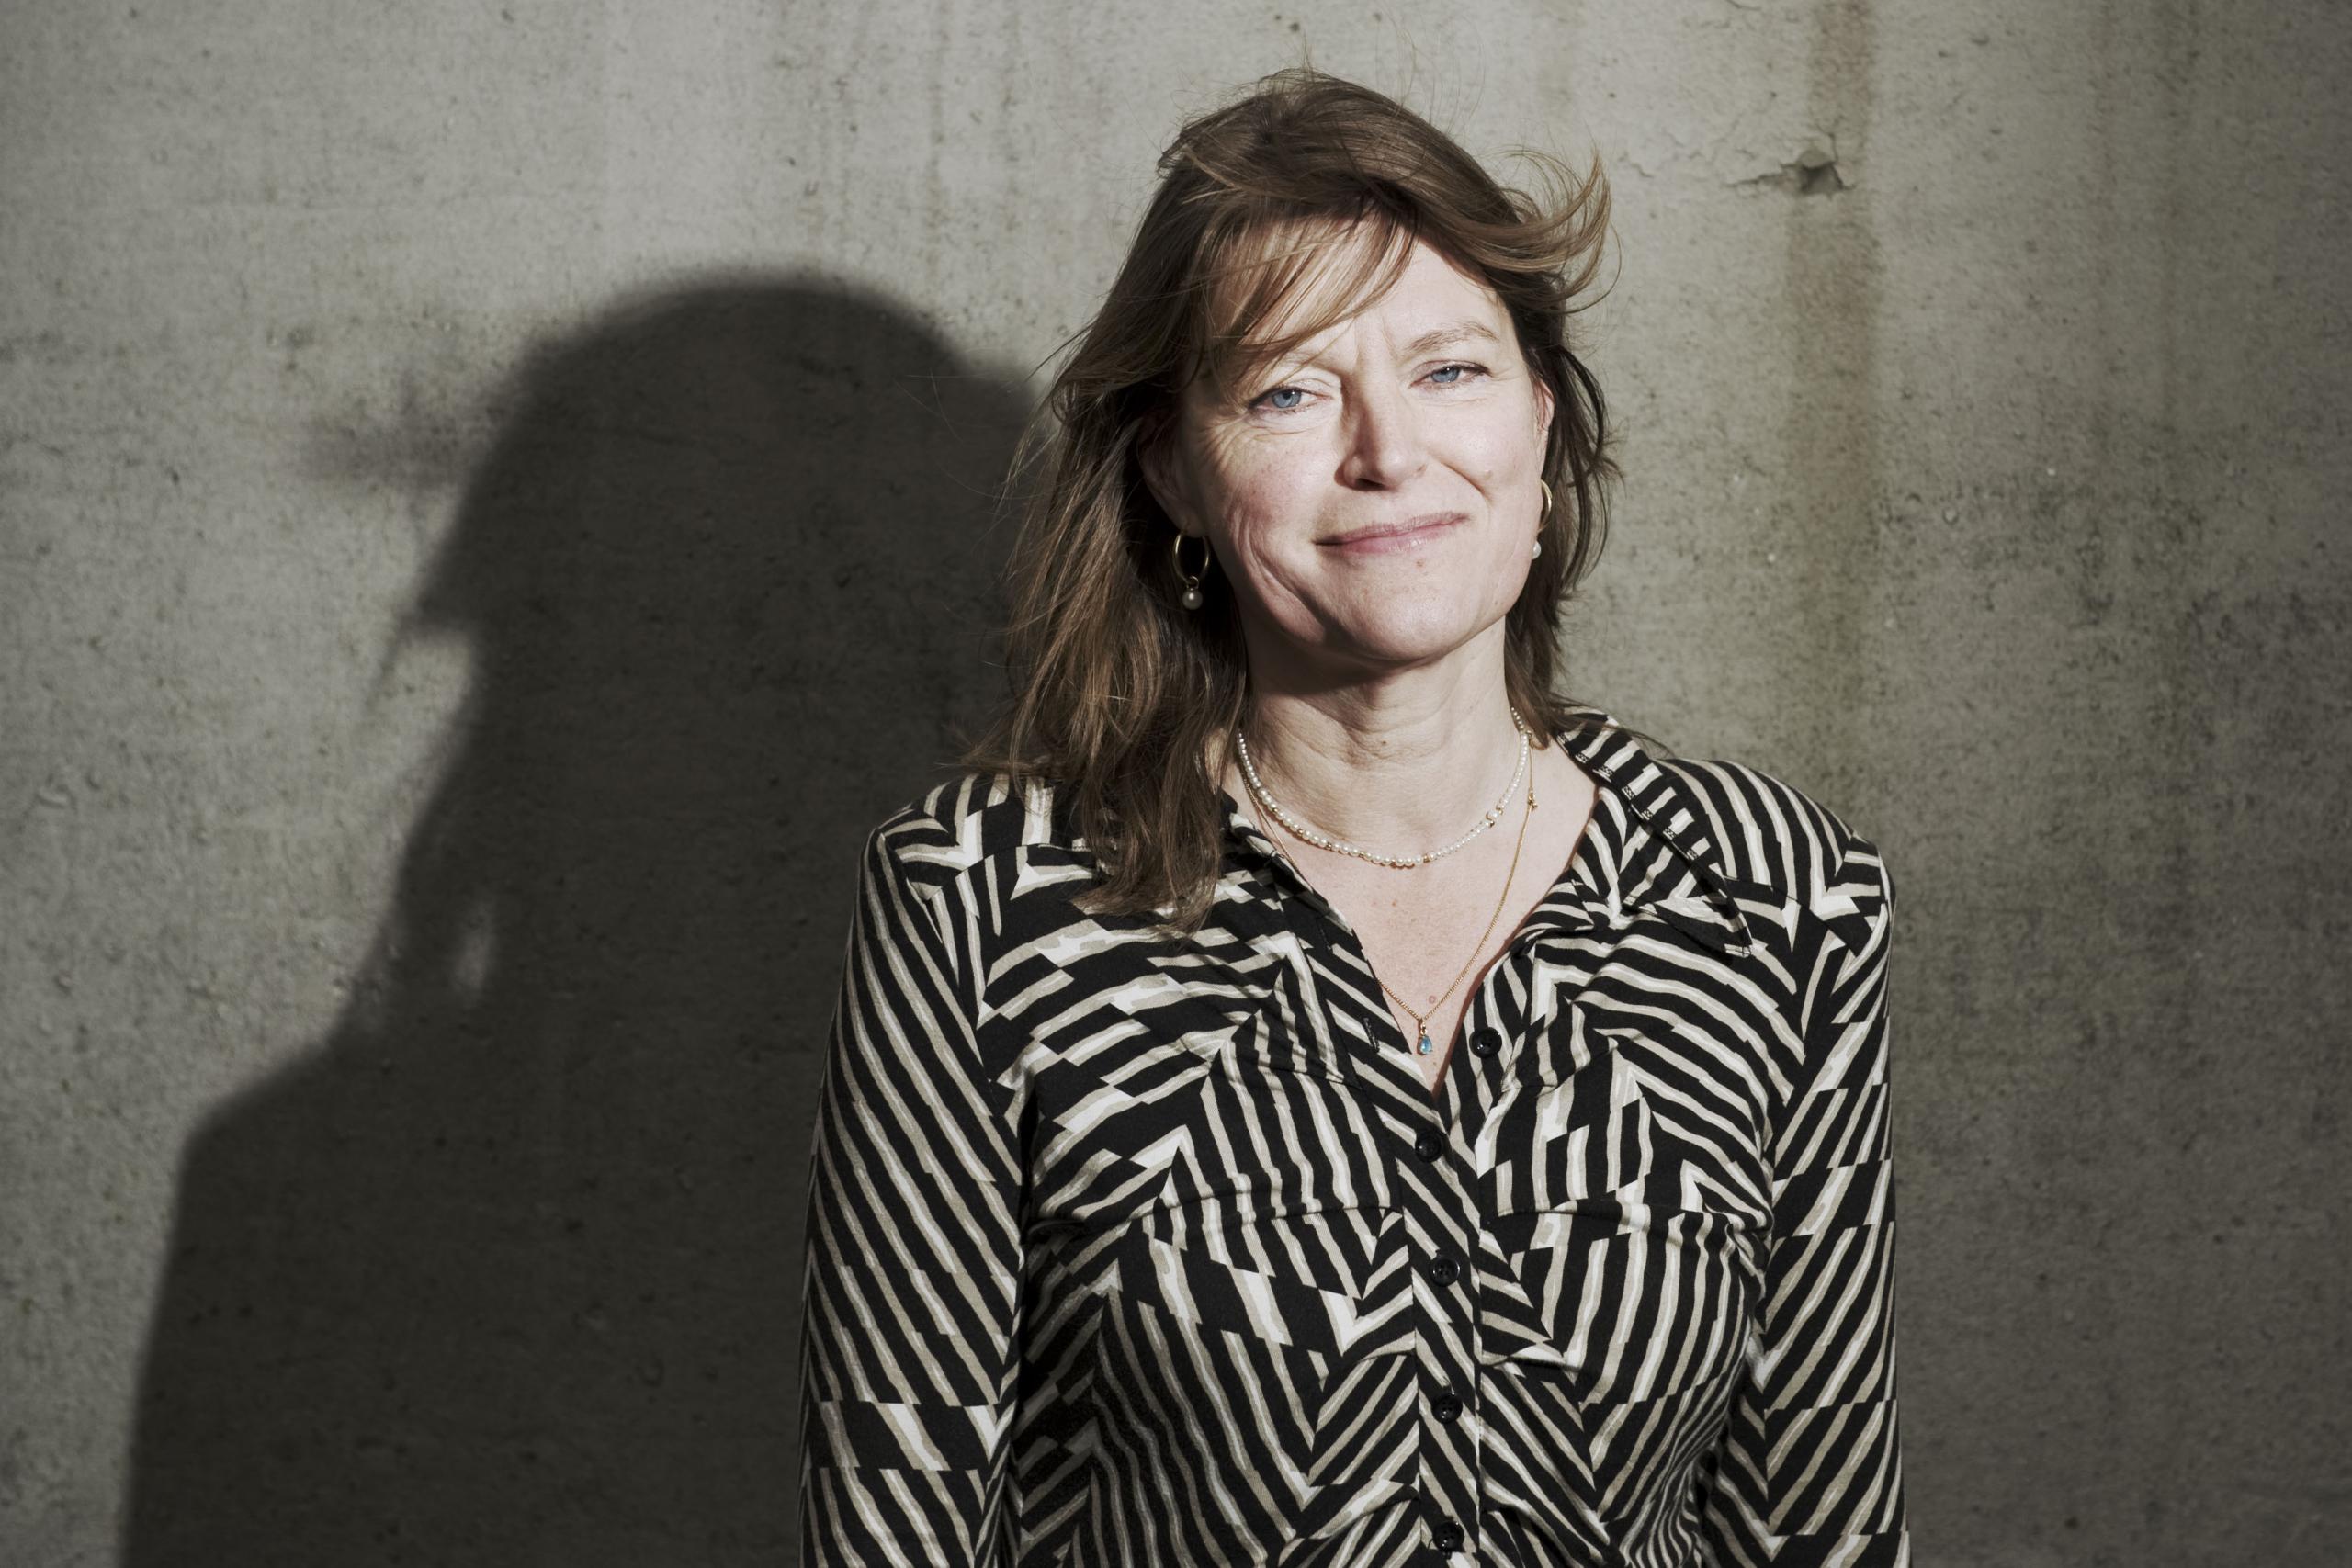 Margrite Kalverboer